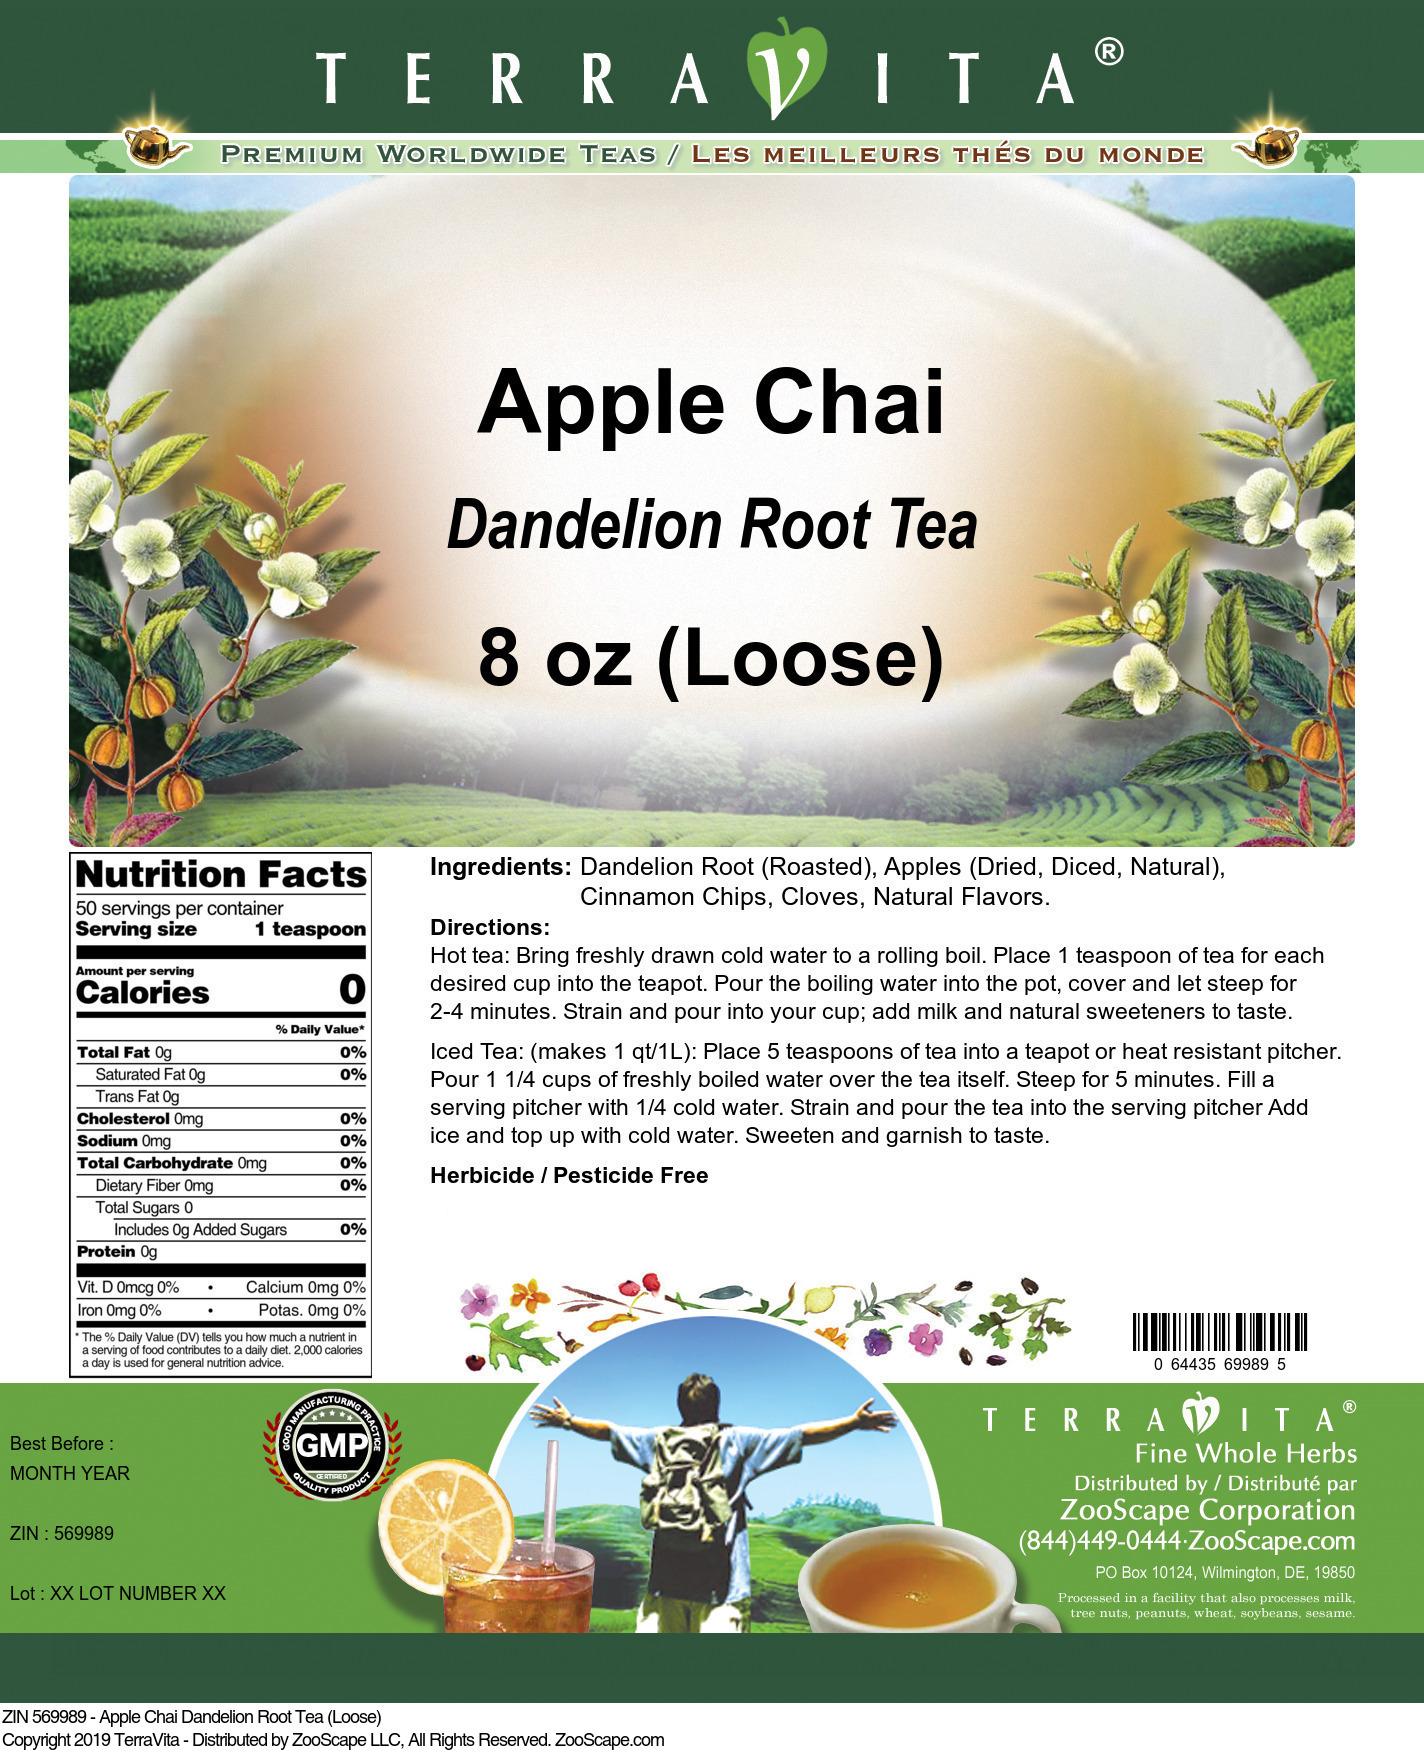 Apple Chai Dandelion Root Tea (Loose)